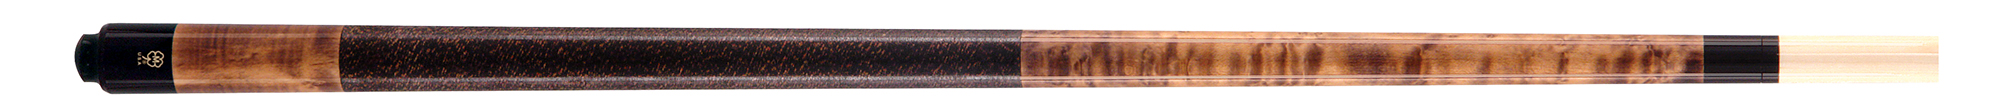 PK3061: McDermott GS07 DW grey/walnut pool #1